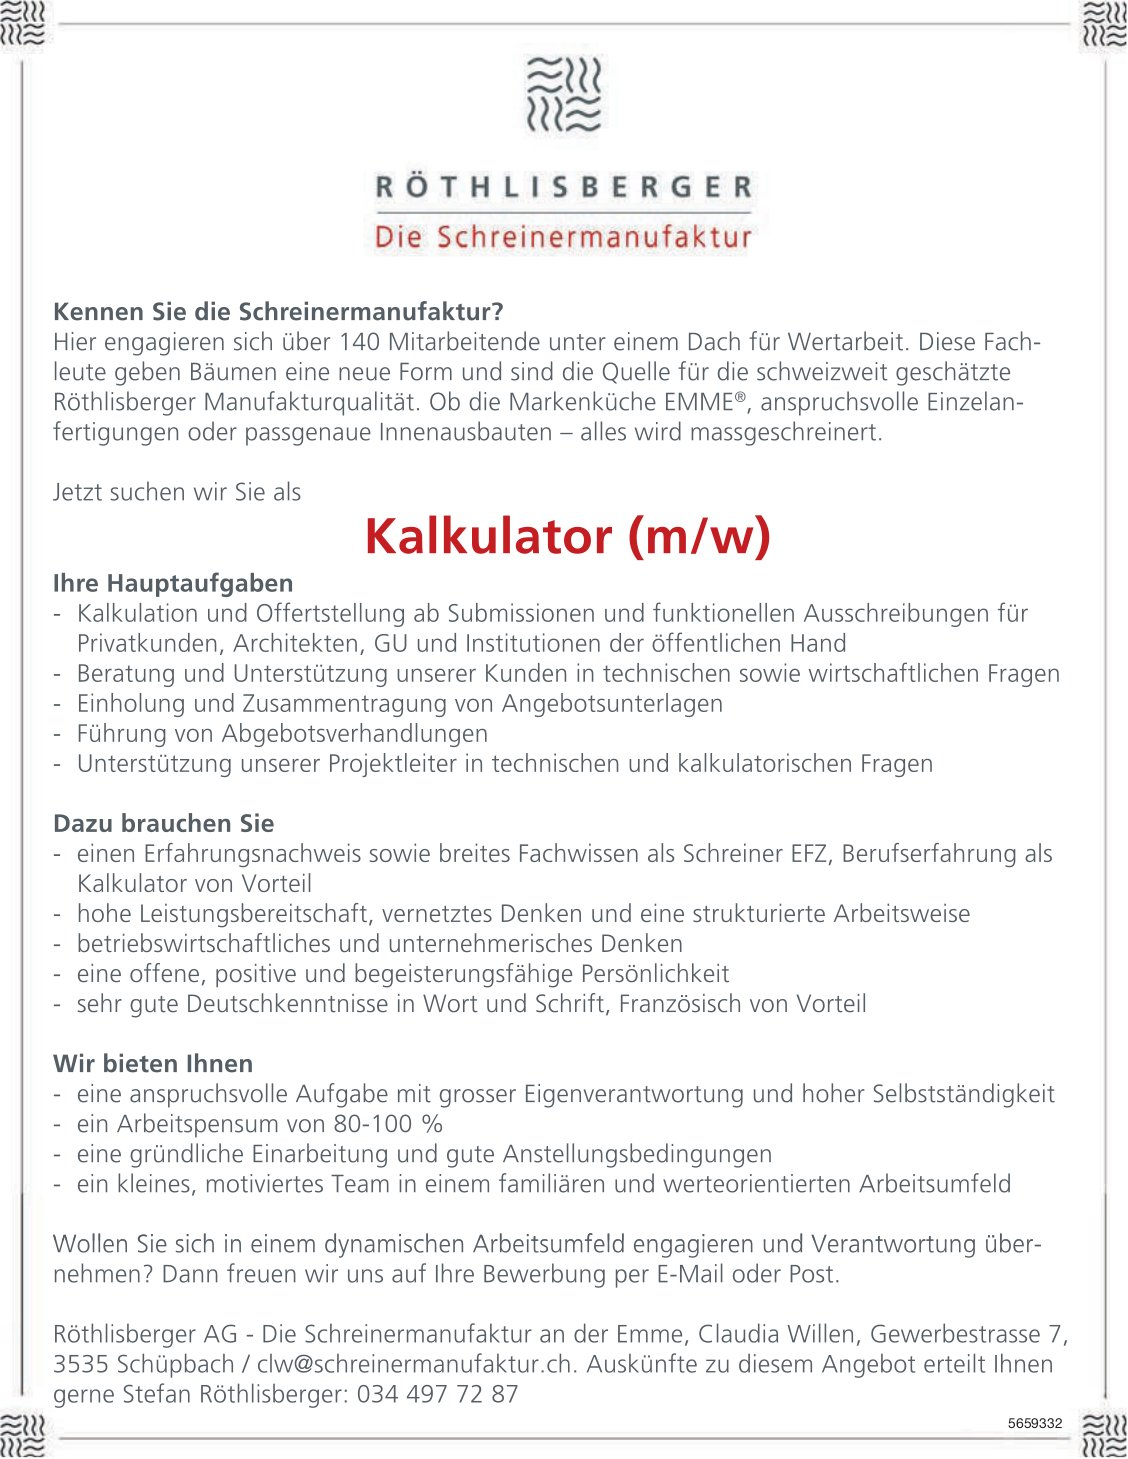 Kalkulator (m/w), Röthlisberger AG, Schüpbach, gesucht